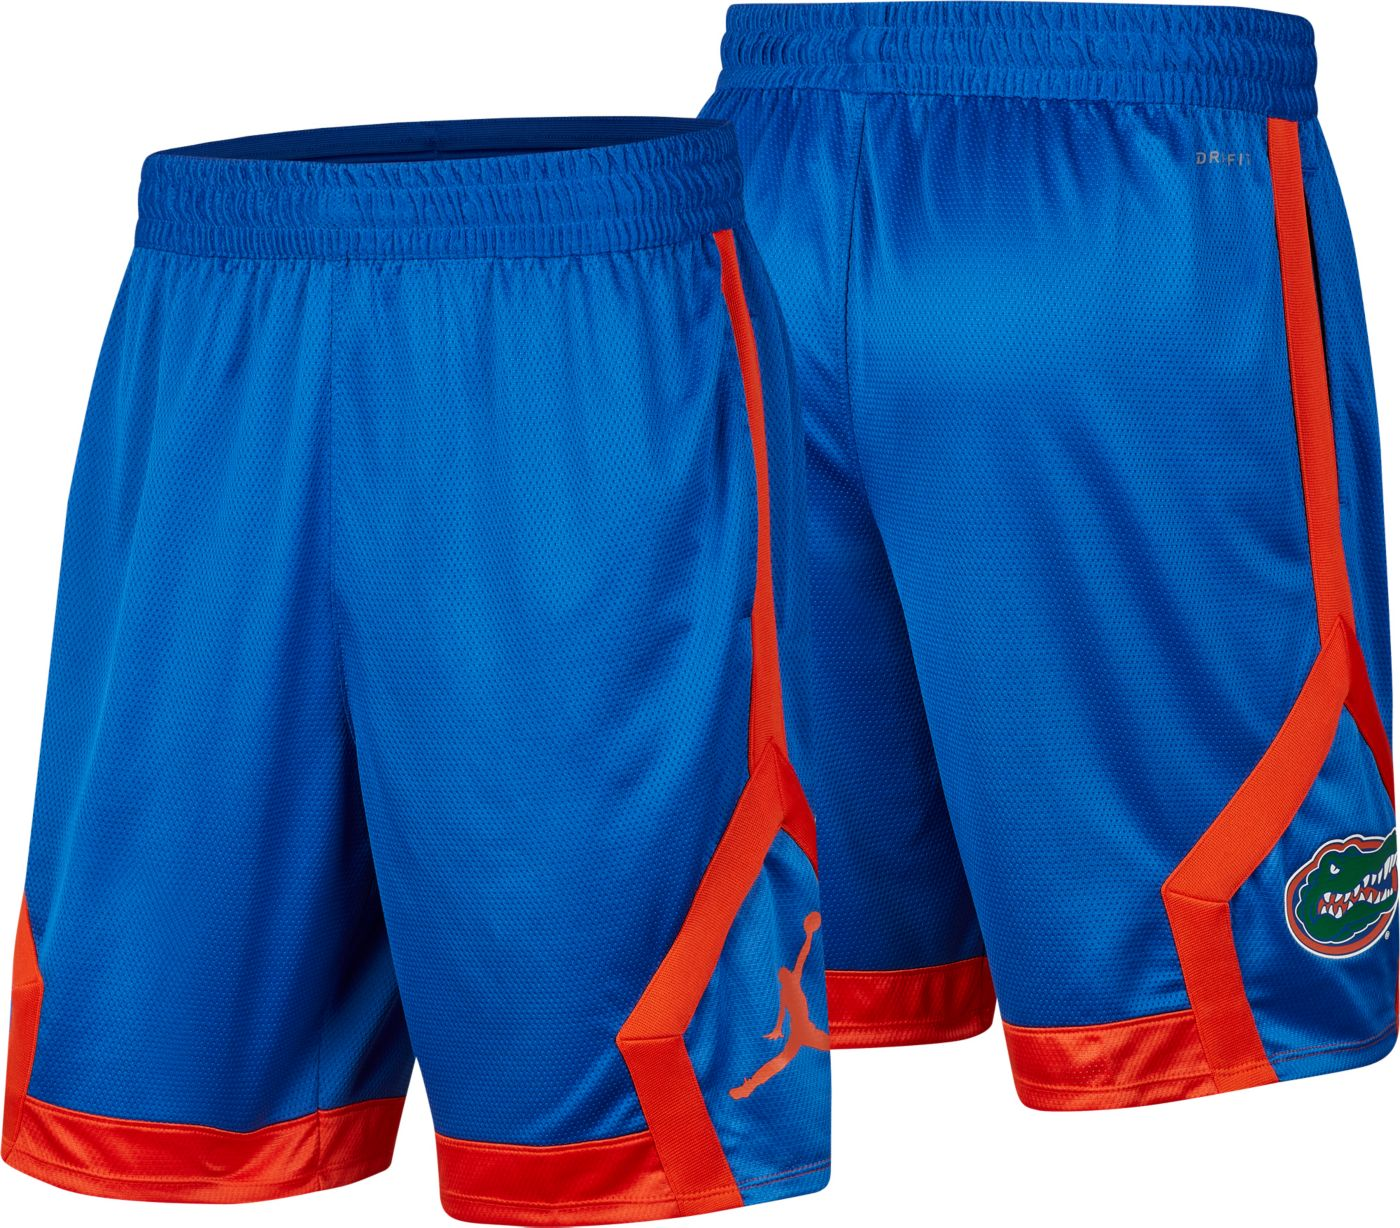 Jordan Men's Florida Gators Blue Knit Shorts